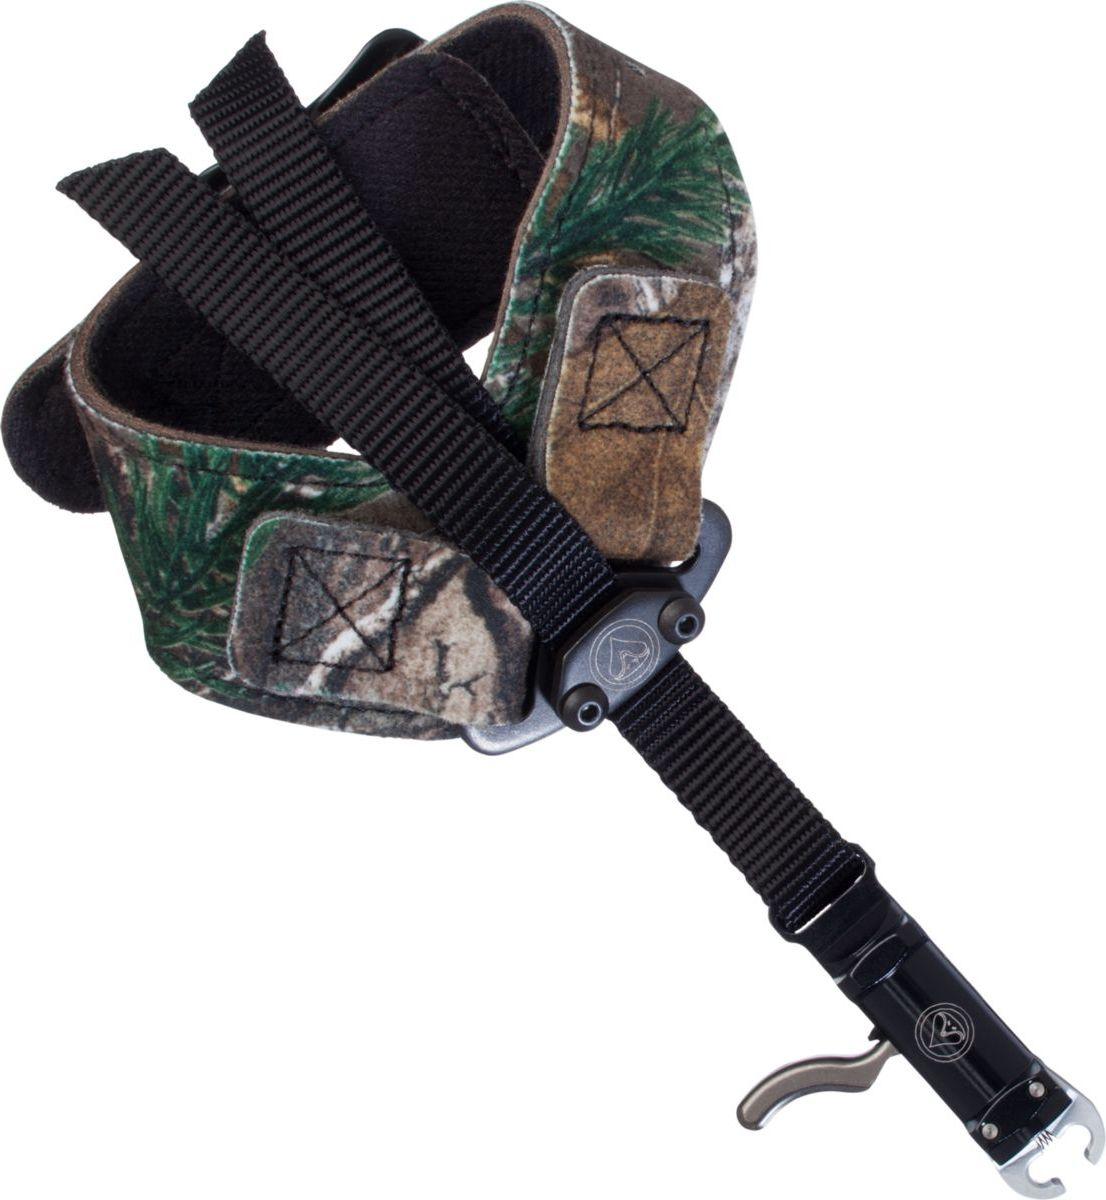 Cobra® Trophy Sidewinder Buckle Strap Bow Release